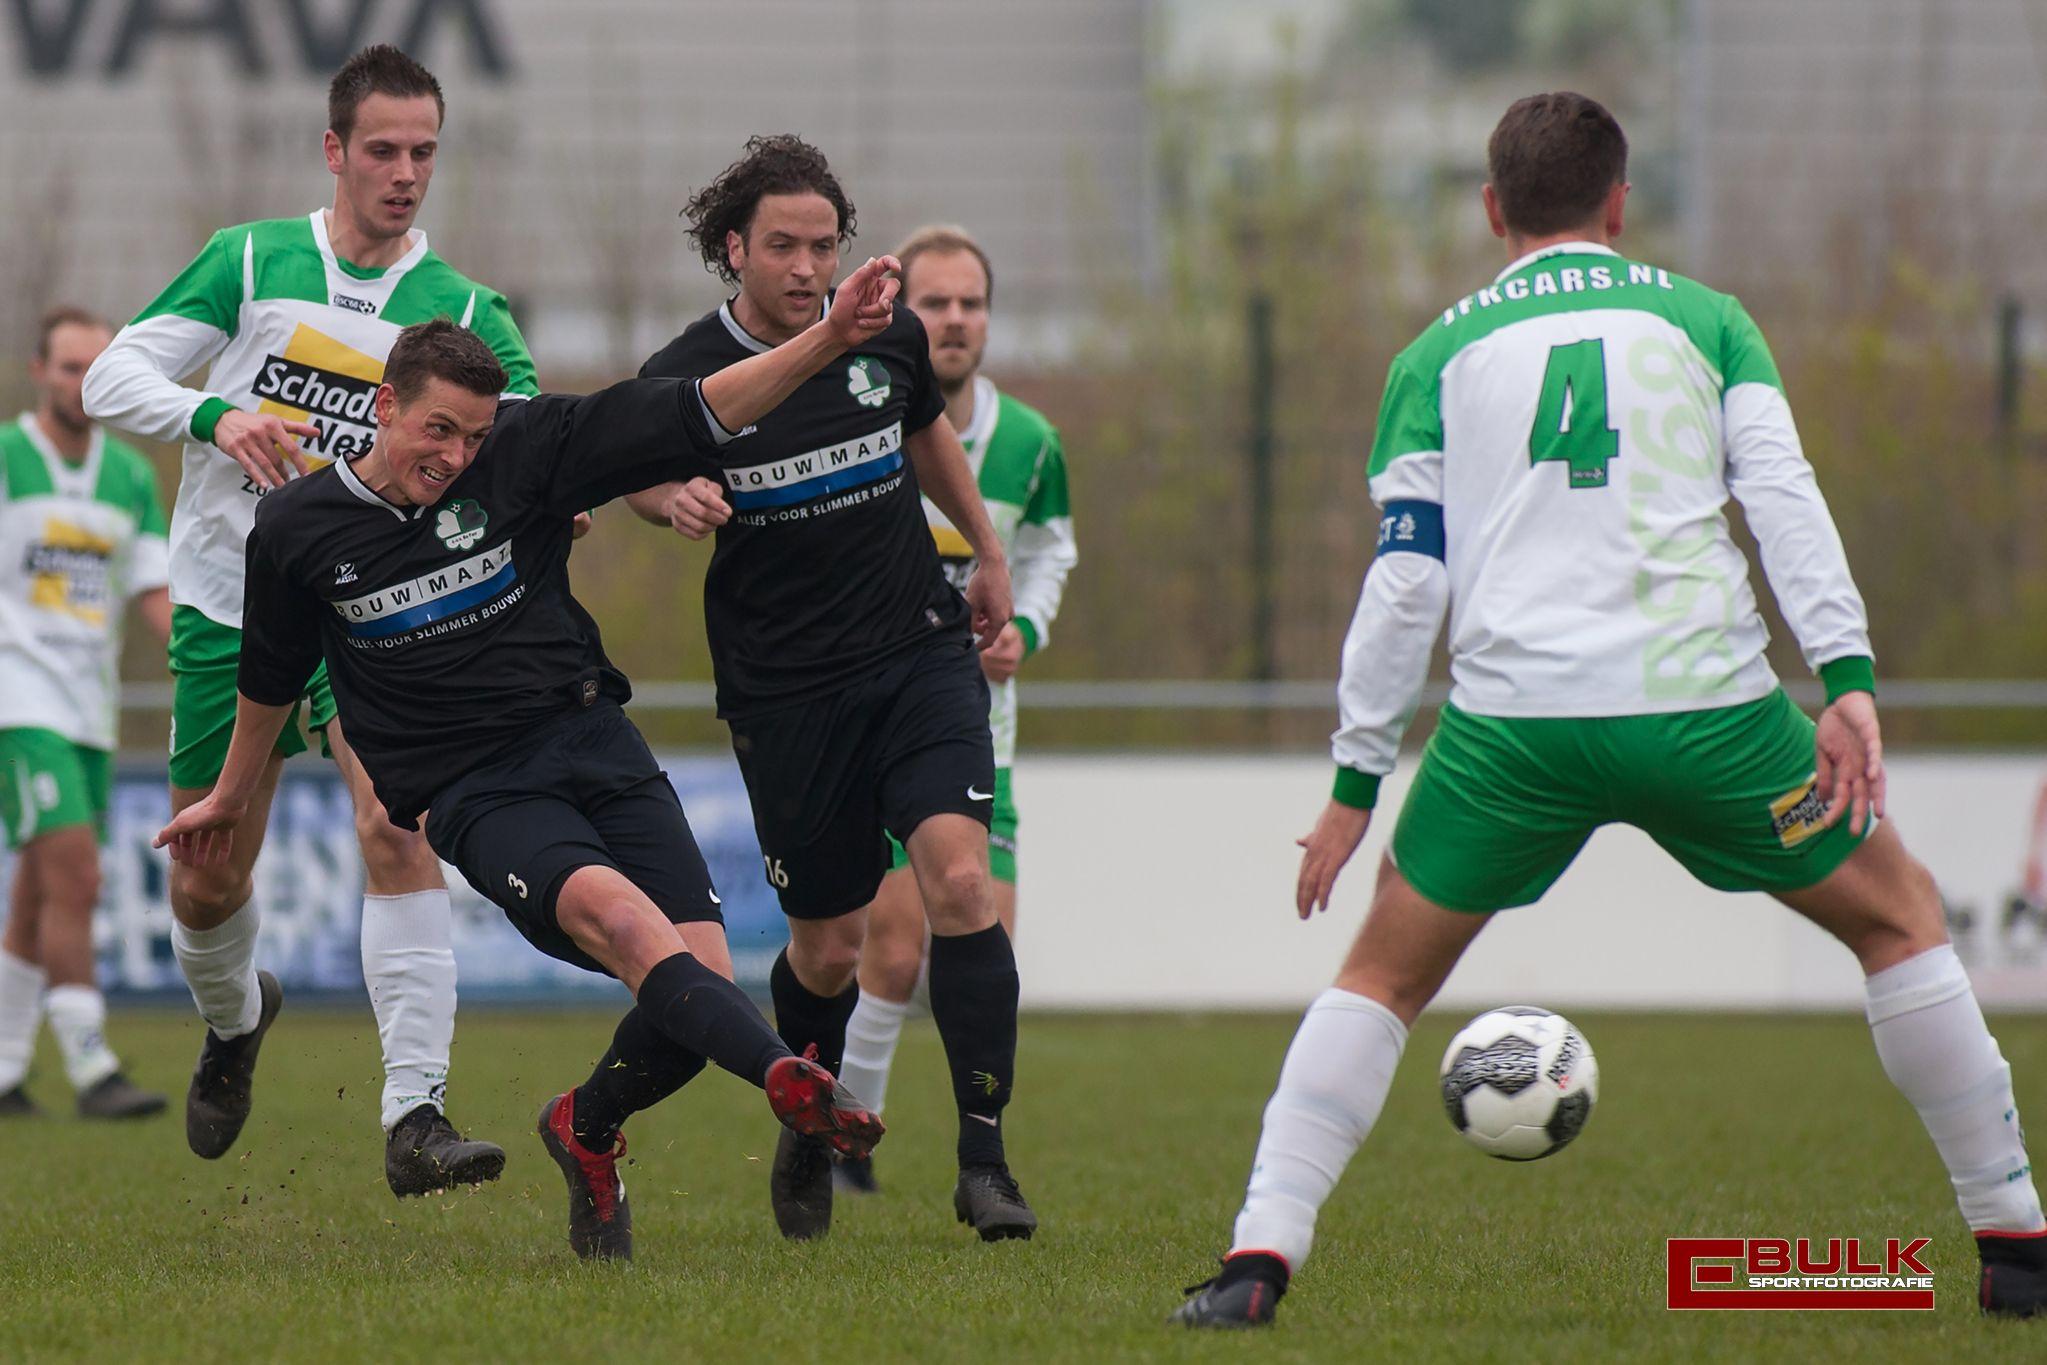 ebs_0105-ed_bulk_sportfotografie